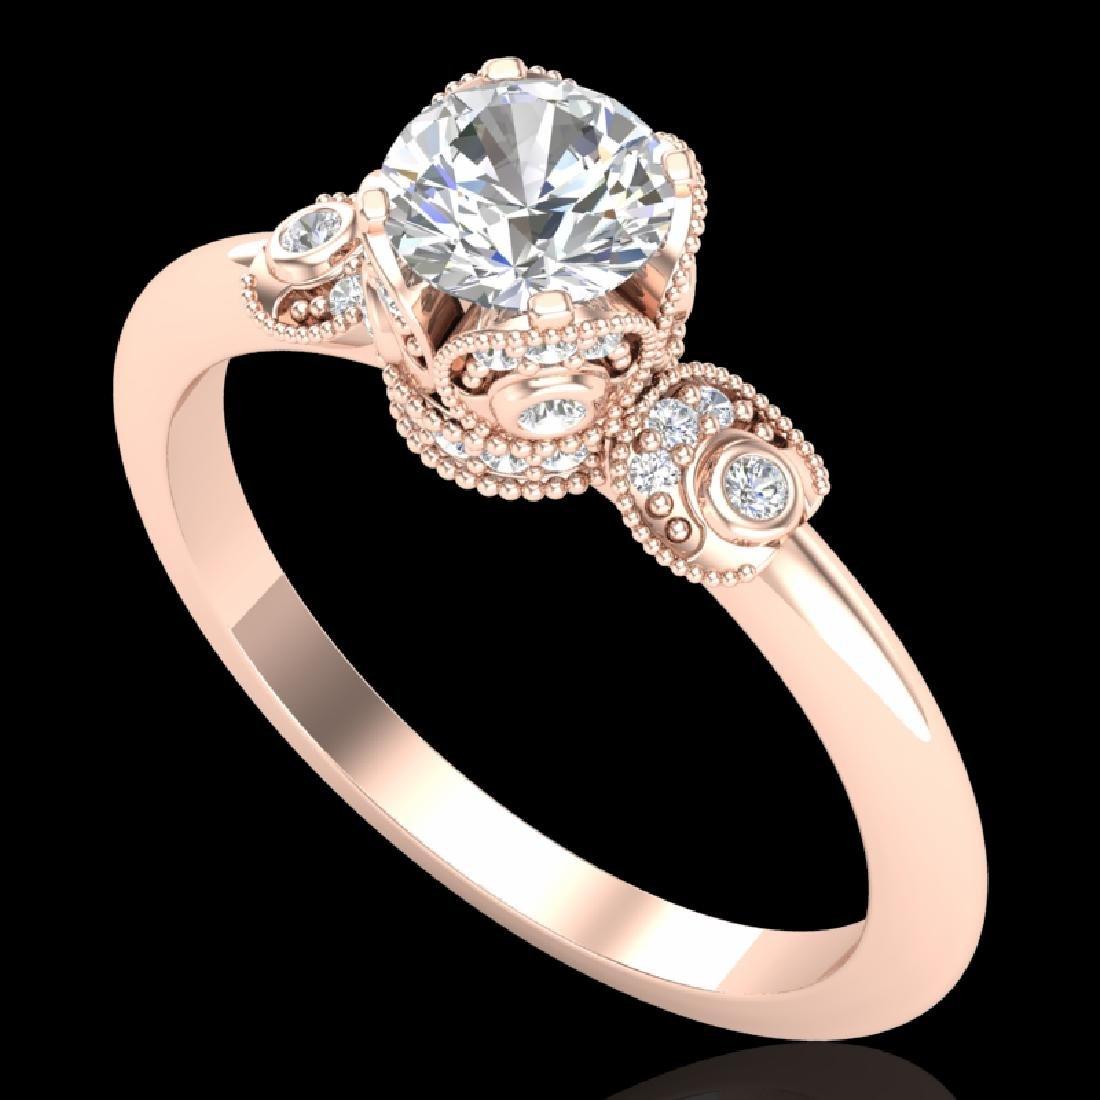 1 CTW VS/SI Diamond Solitaire Art Deco Ring 18K Rose